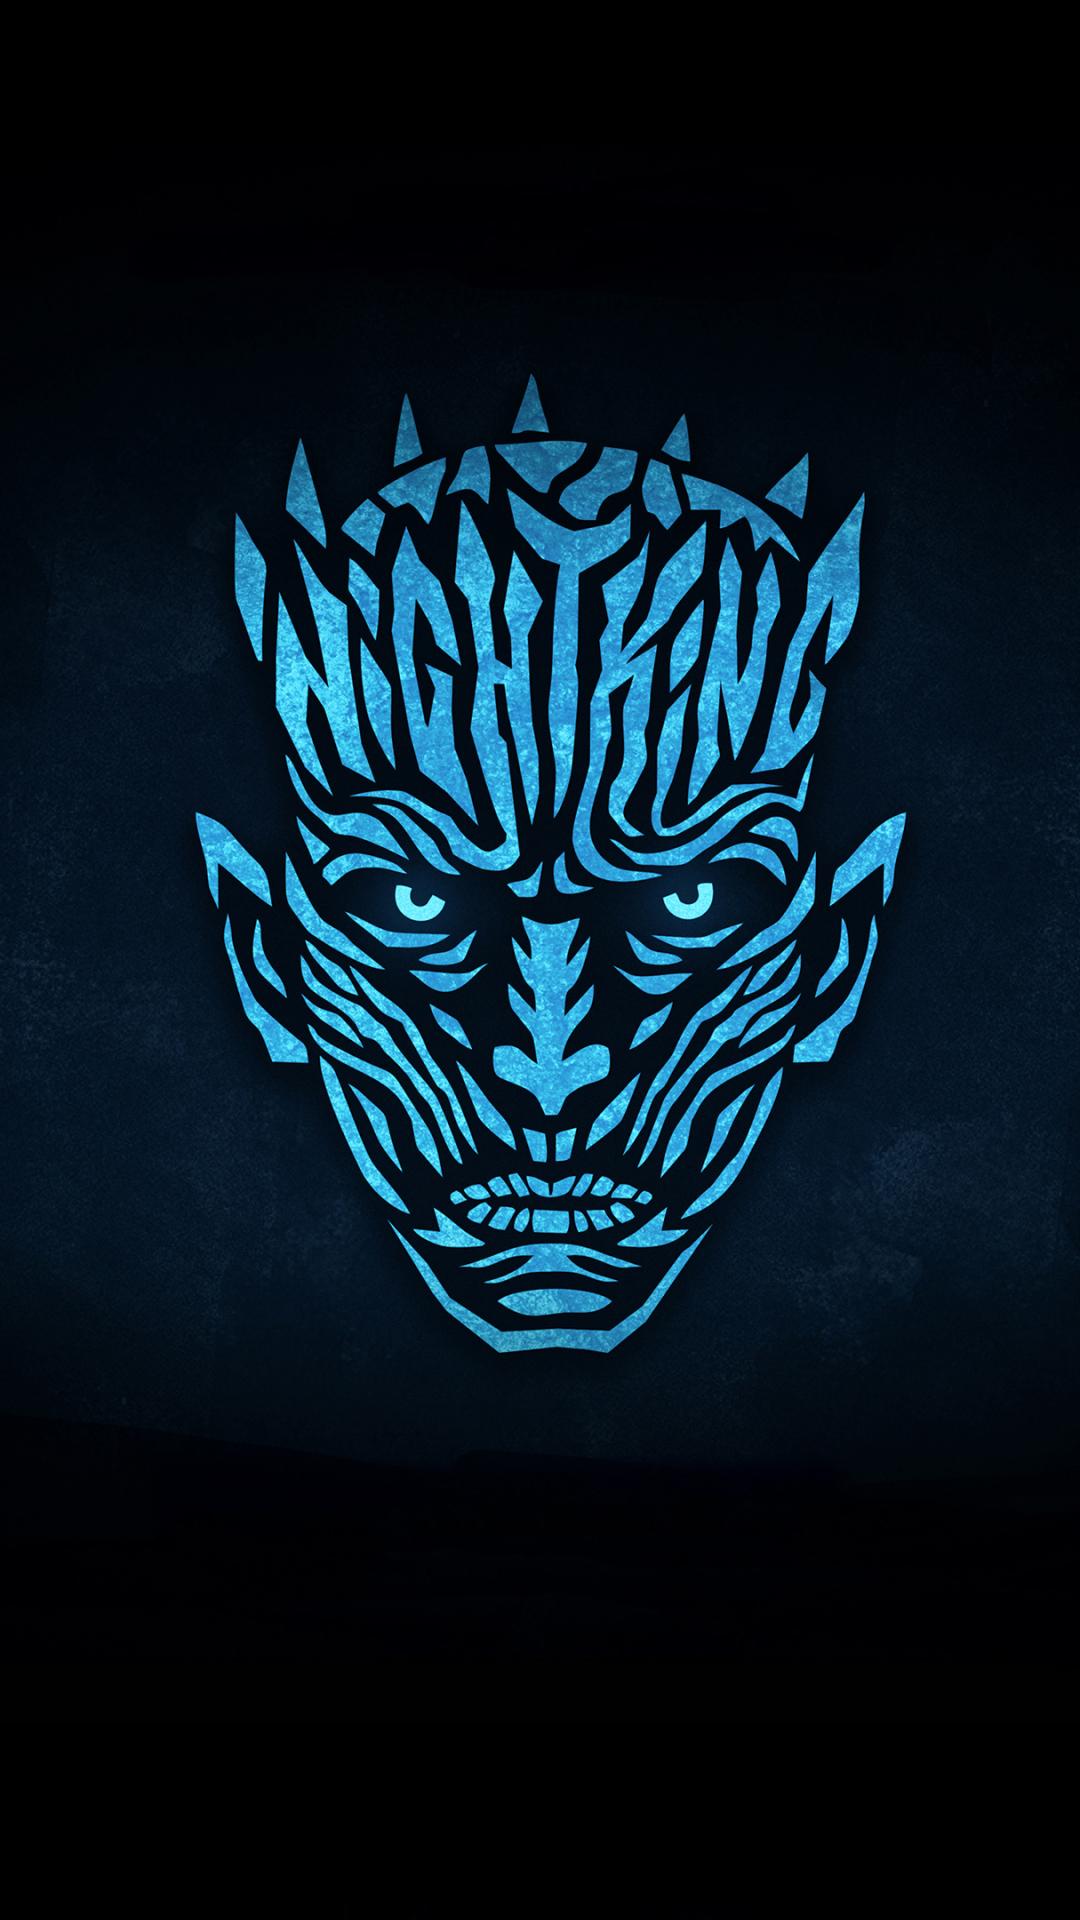 Wallpaper - Gmae Of Thrones Minimalist , HD Wallpaper & Backgrounds